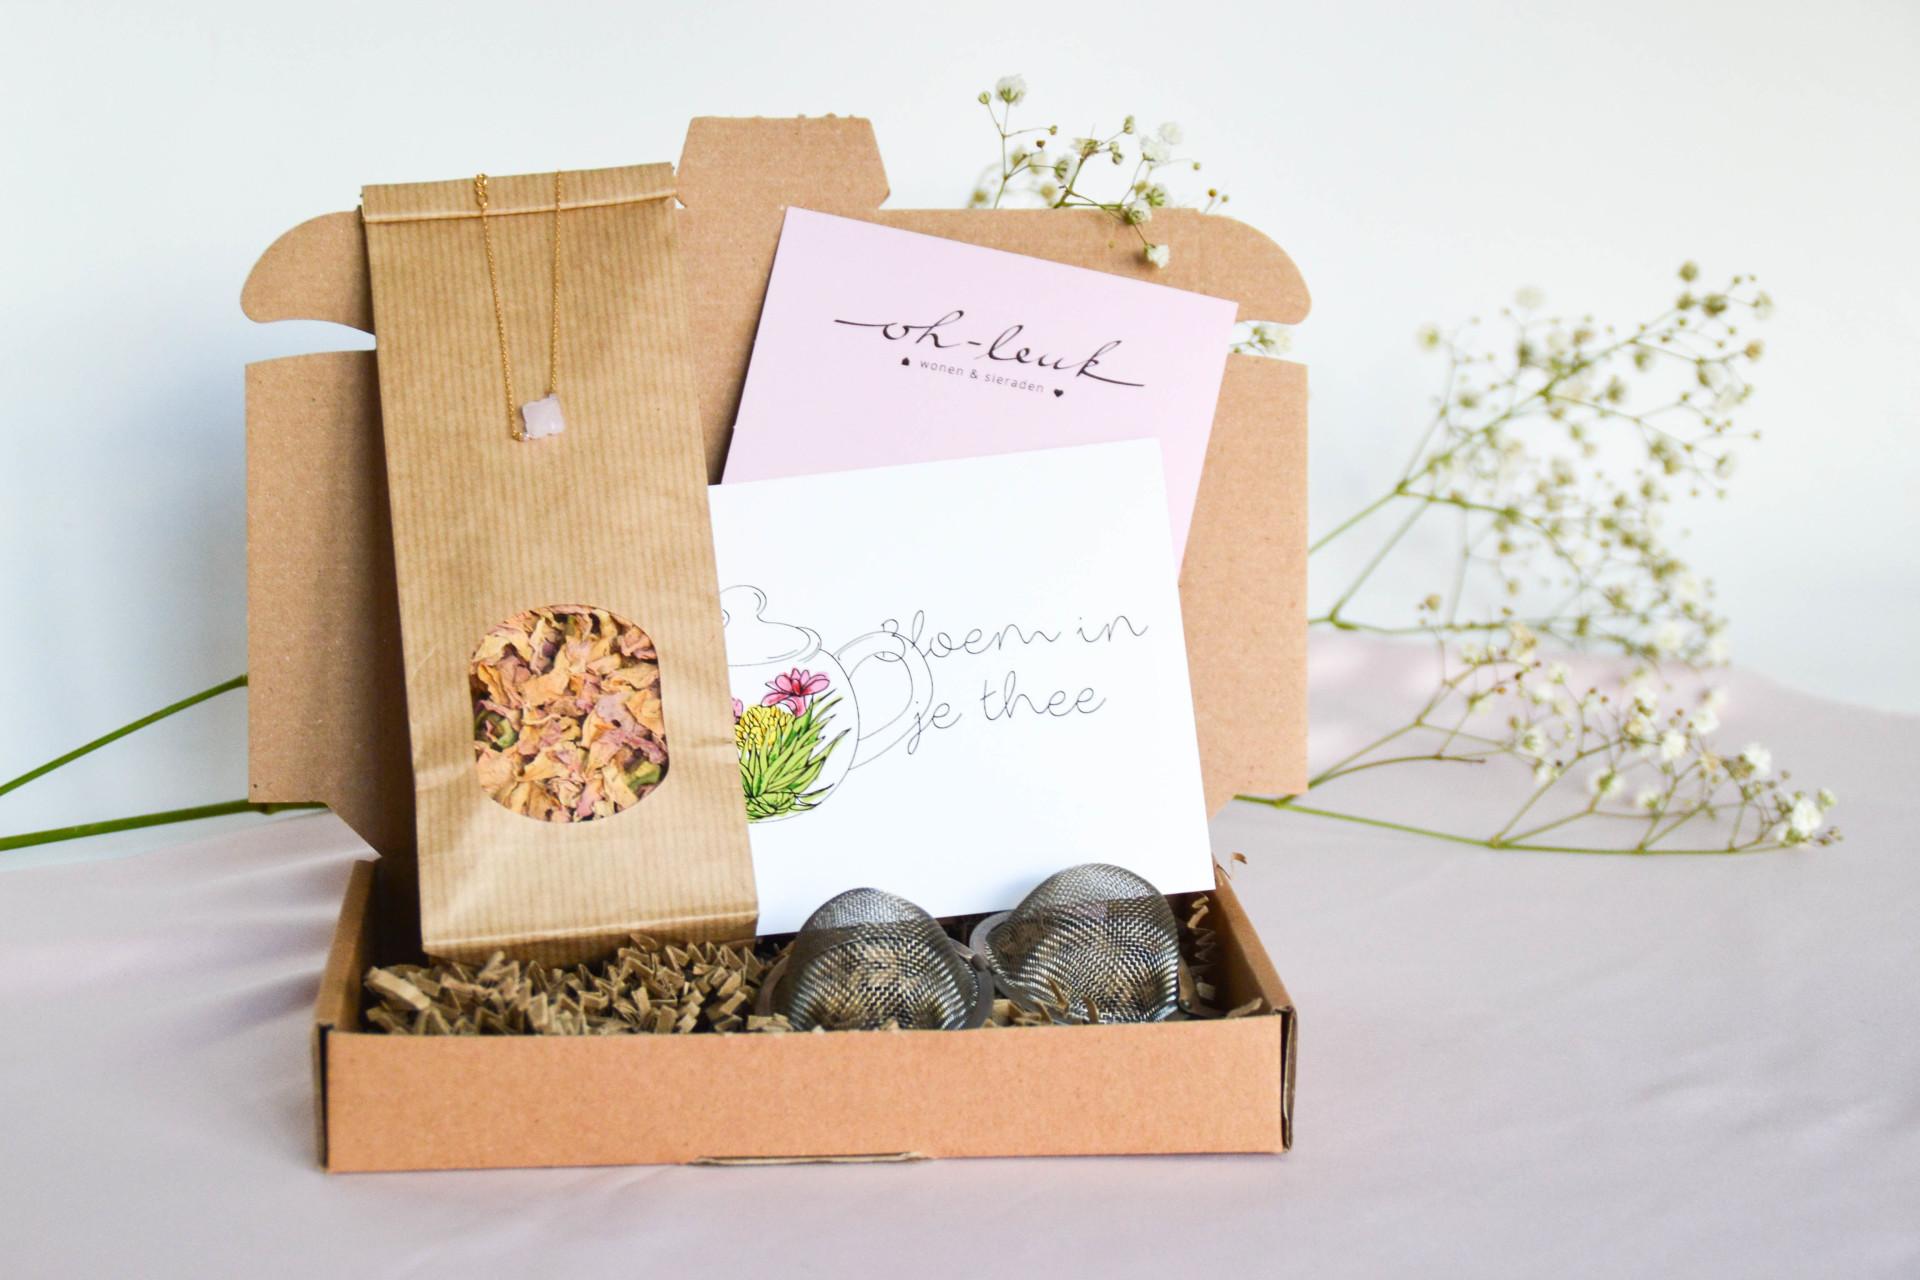 brievenbus cadeau - cadeaus per post - cadeaus door de brievenbus - thee cadeau